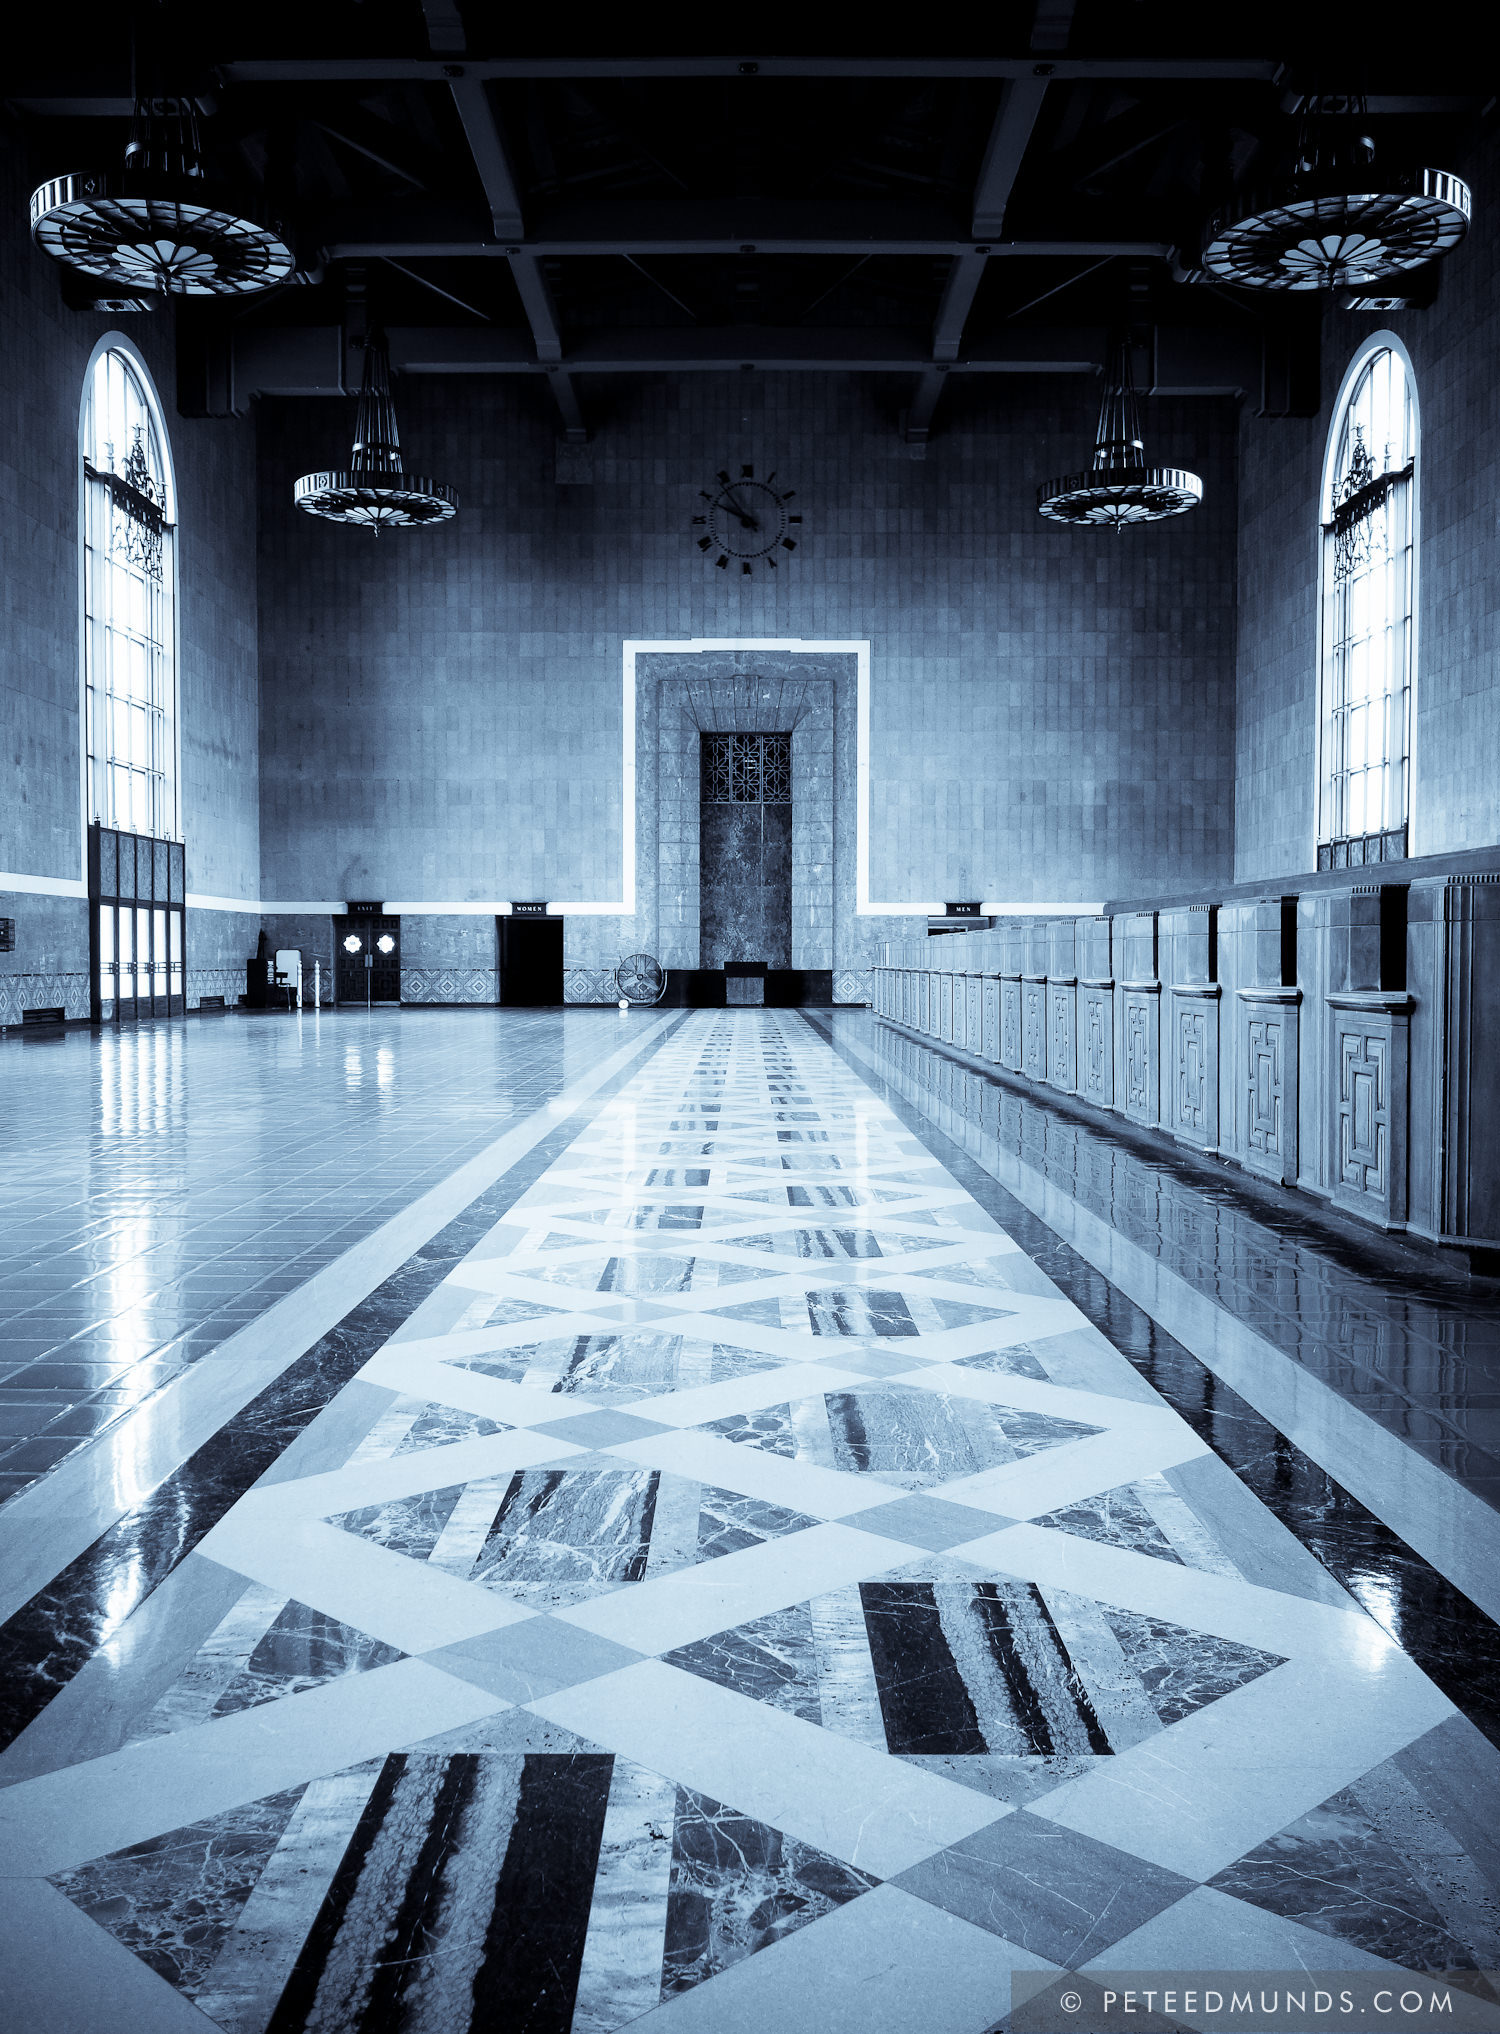 Old Ticketing Hall, Union Station, LA